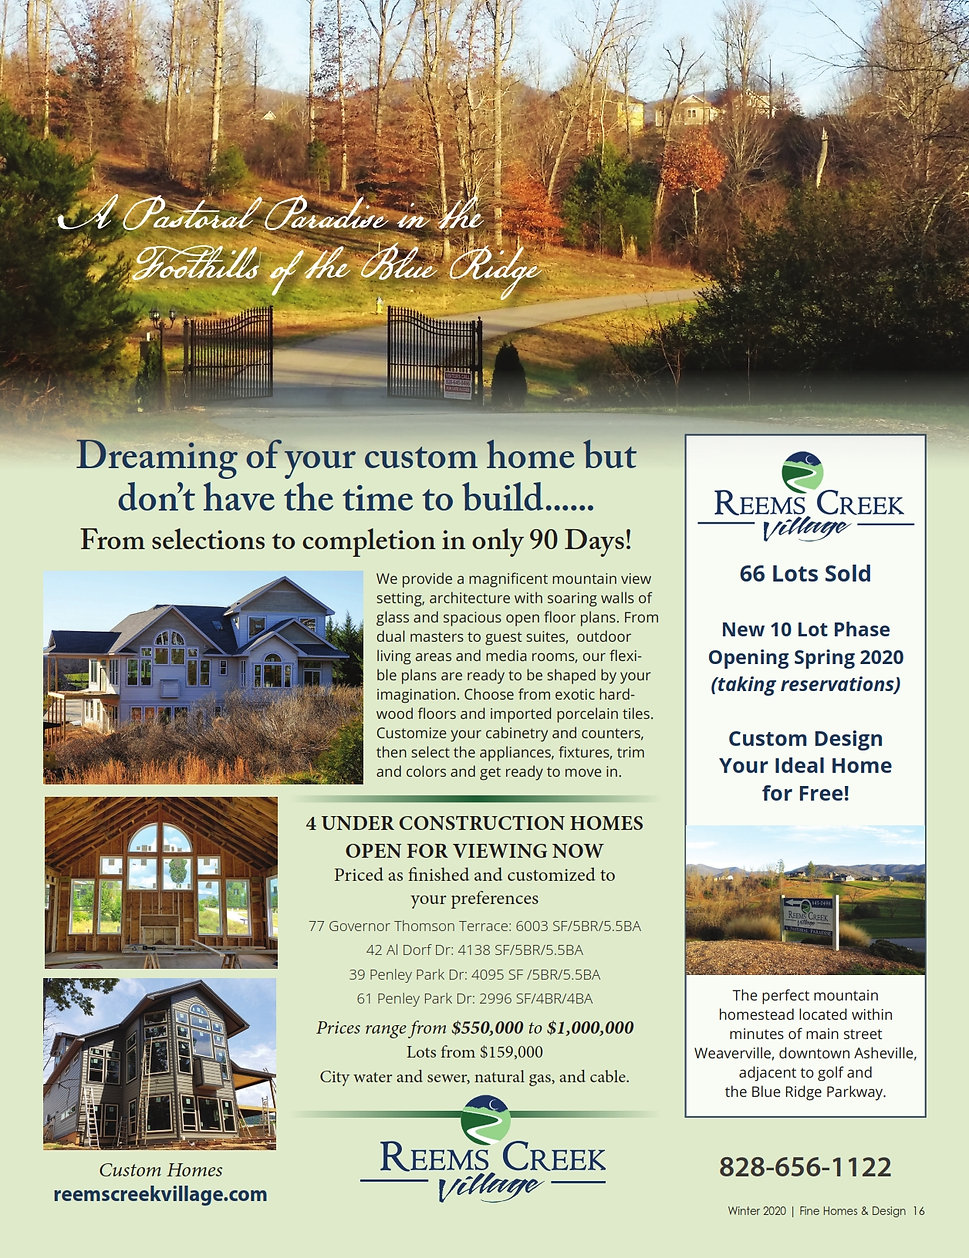 Reems Creek Village AD 1-2020_001.jpg